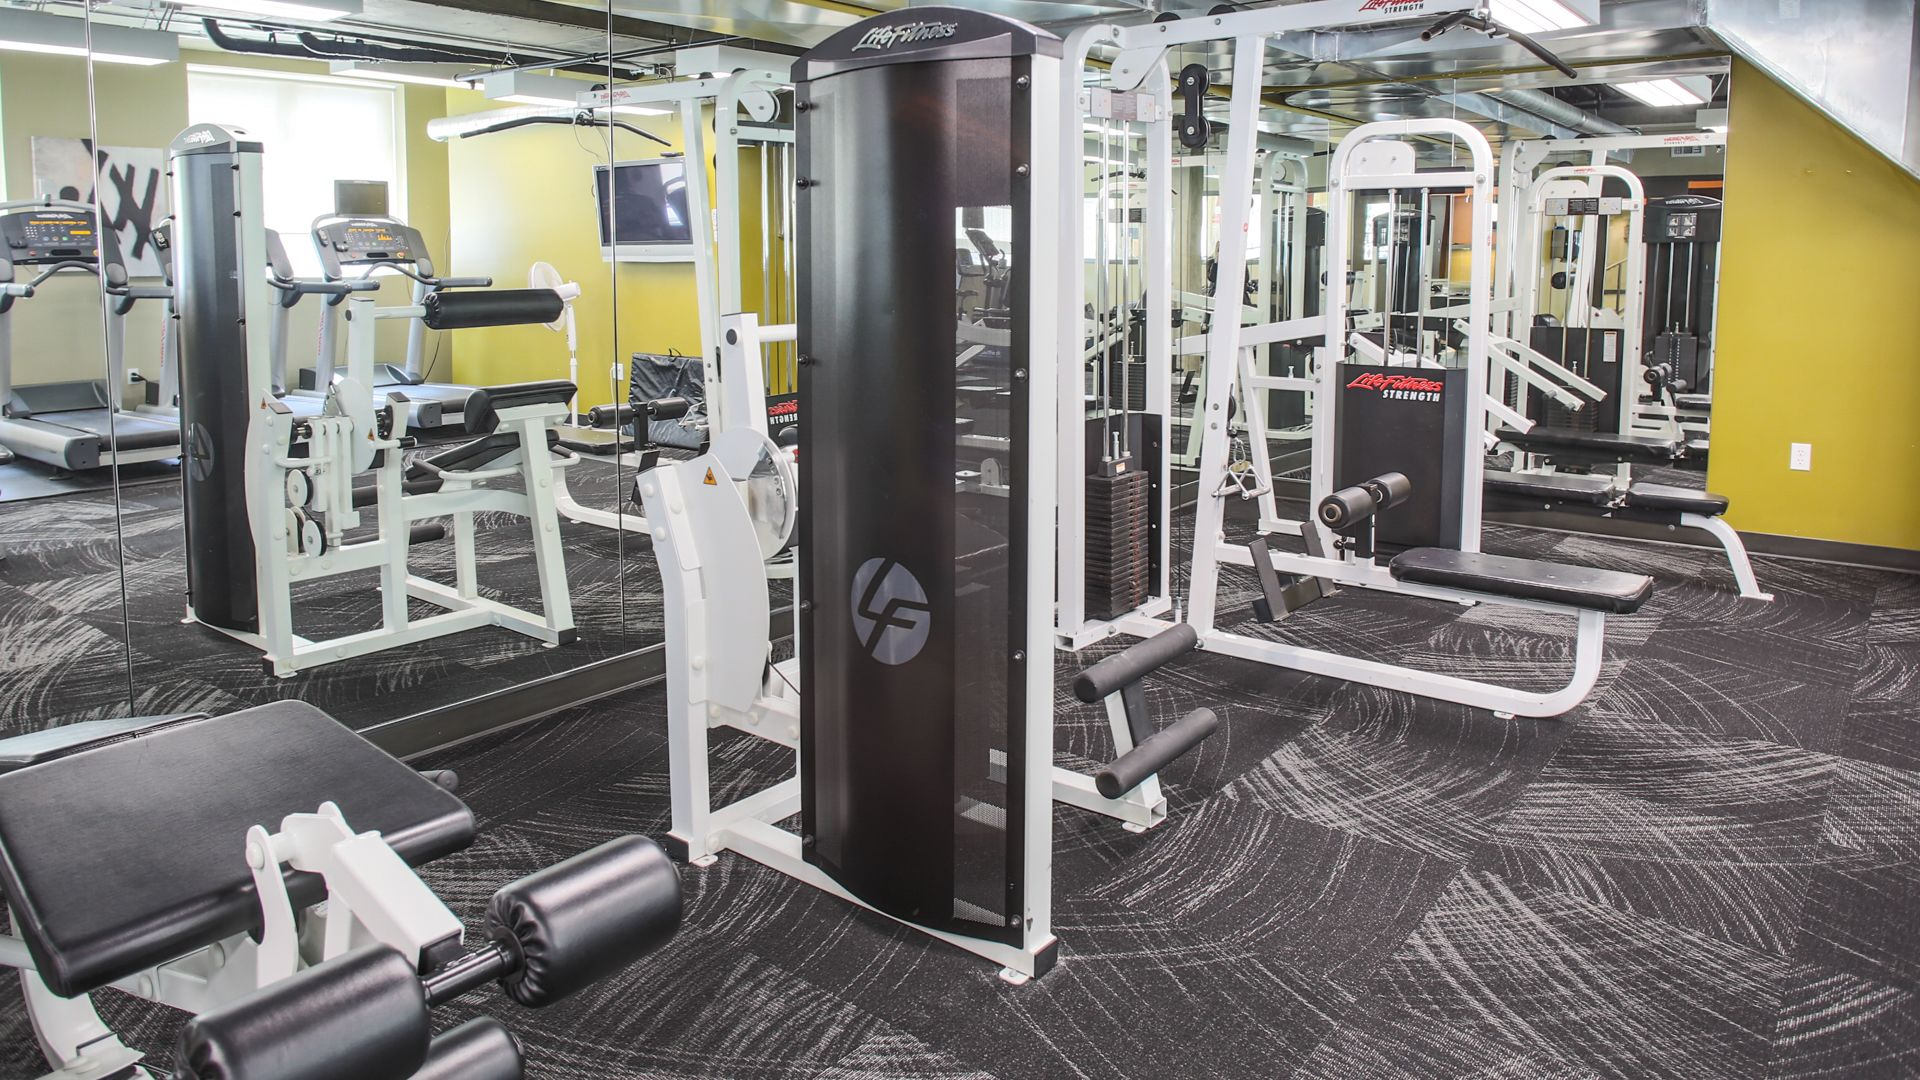 Moda Apartments - Fitness Center